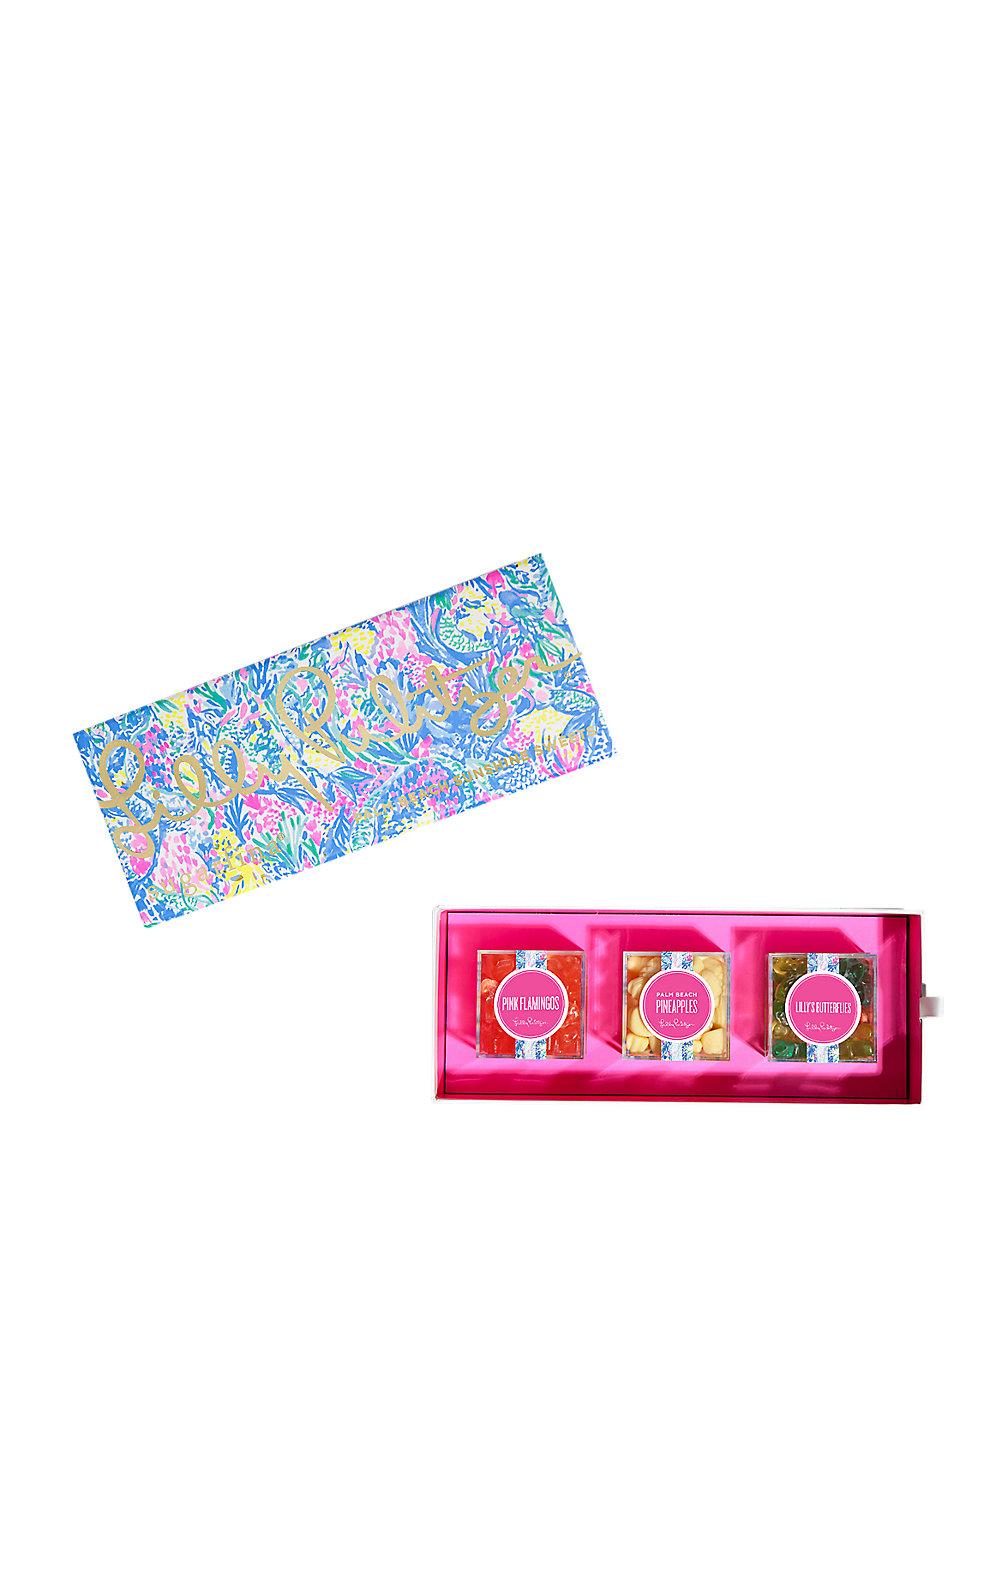 Lilly Pulitzer Lilly Pulitzer x Sugarfina 3 Piece Bento Box